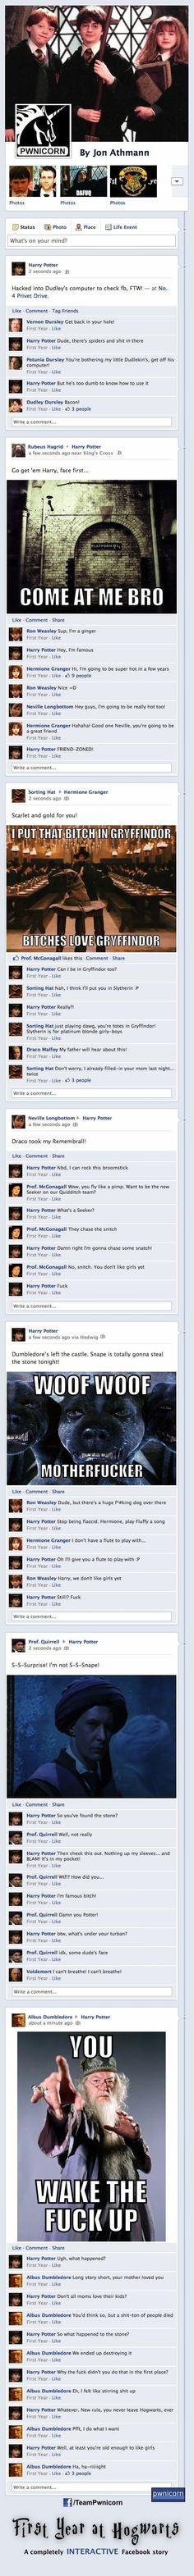 Harry Potter on FB